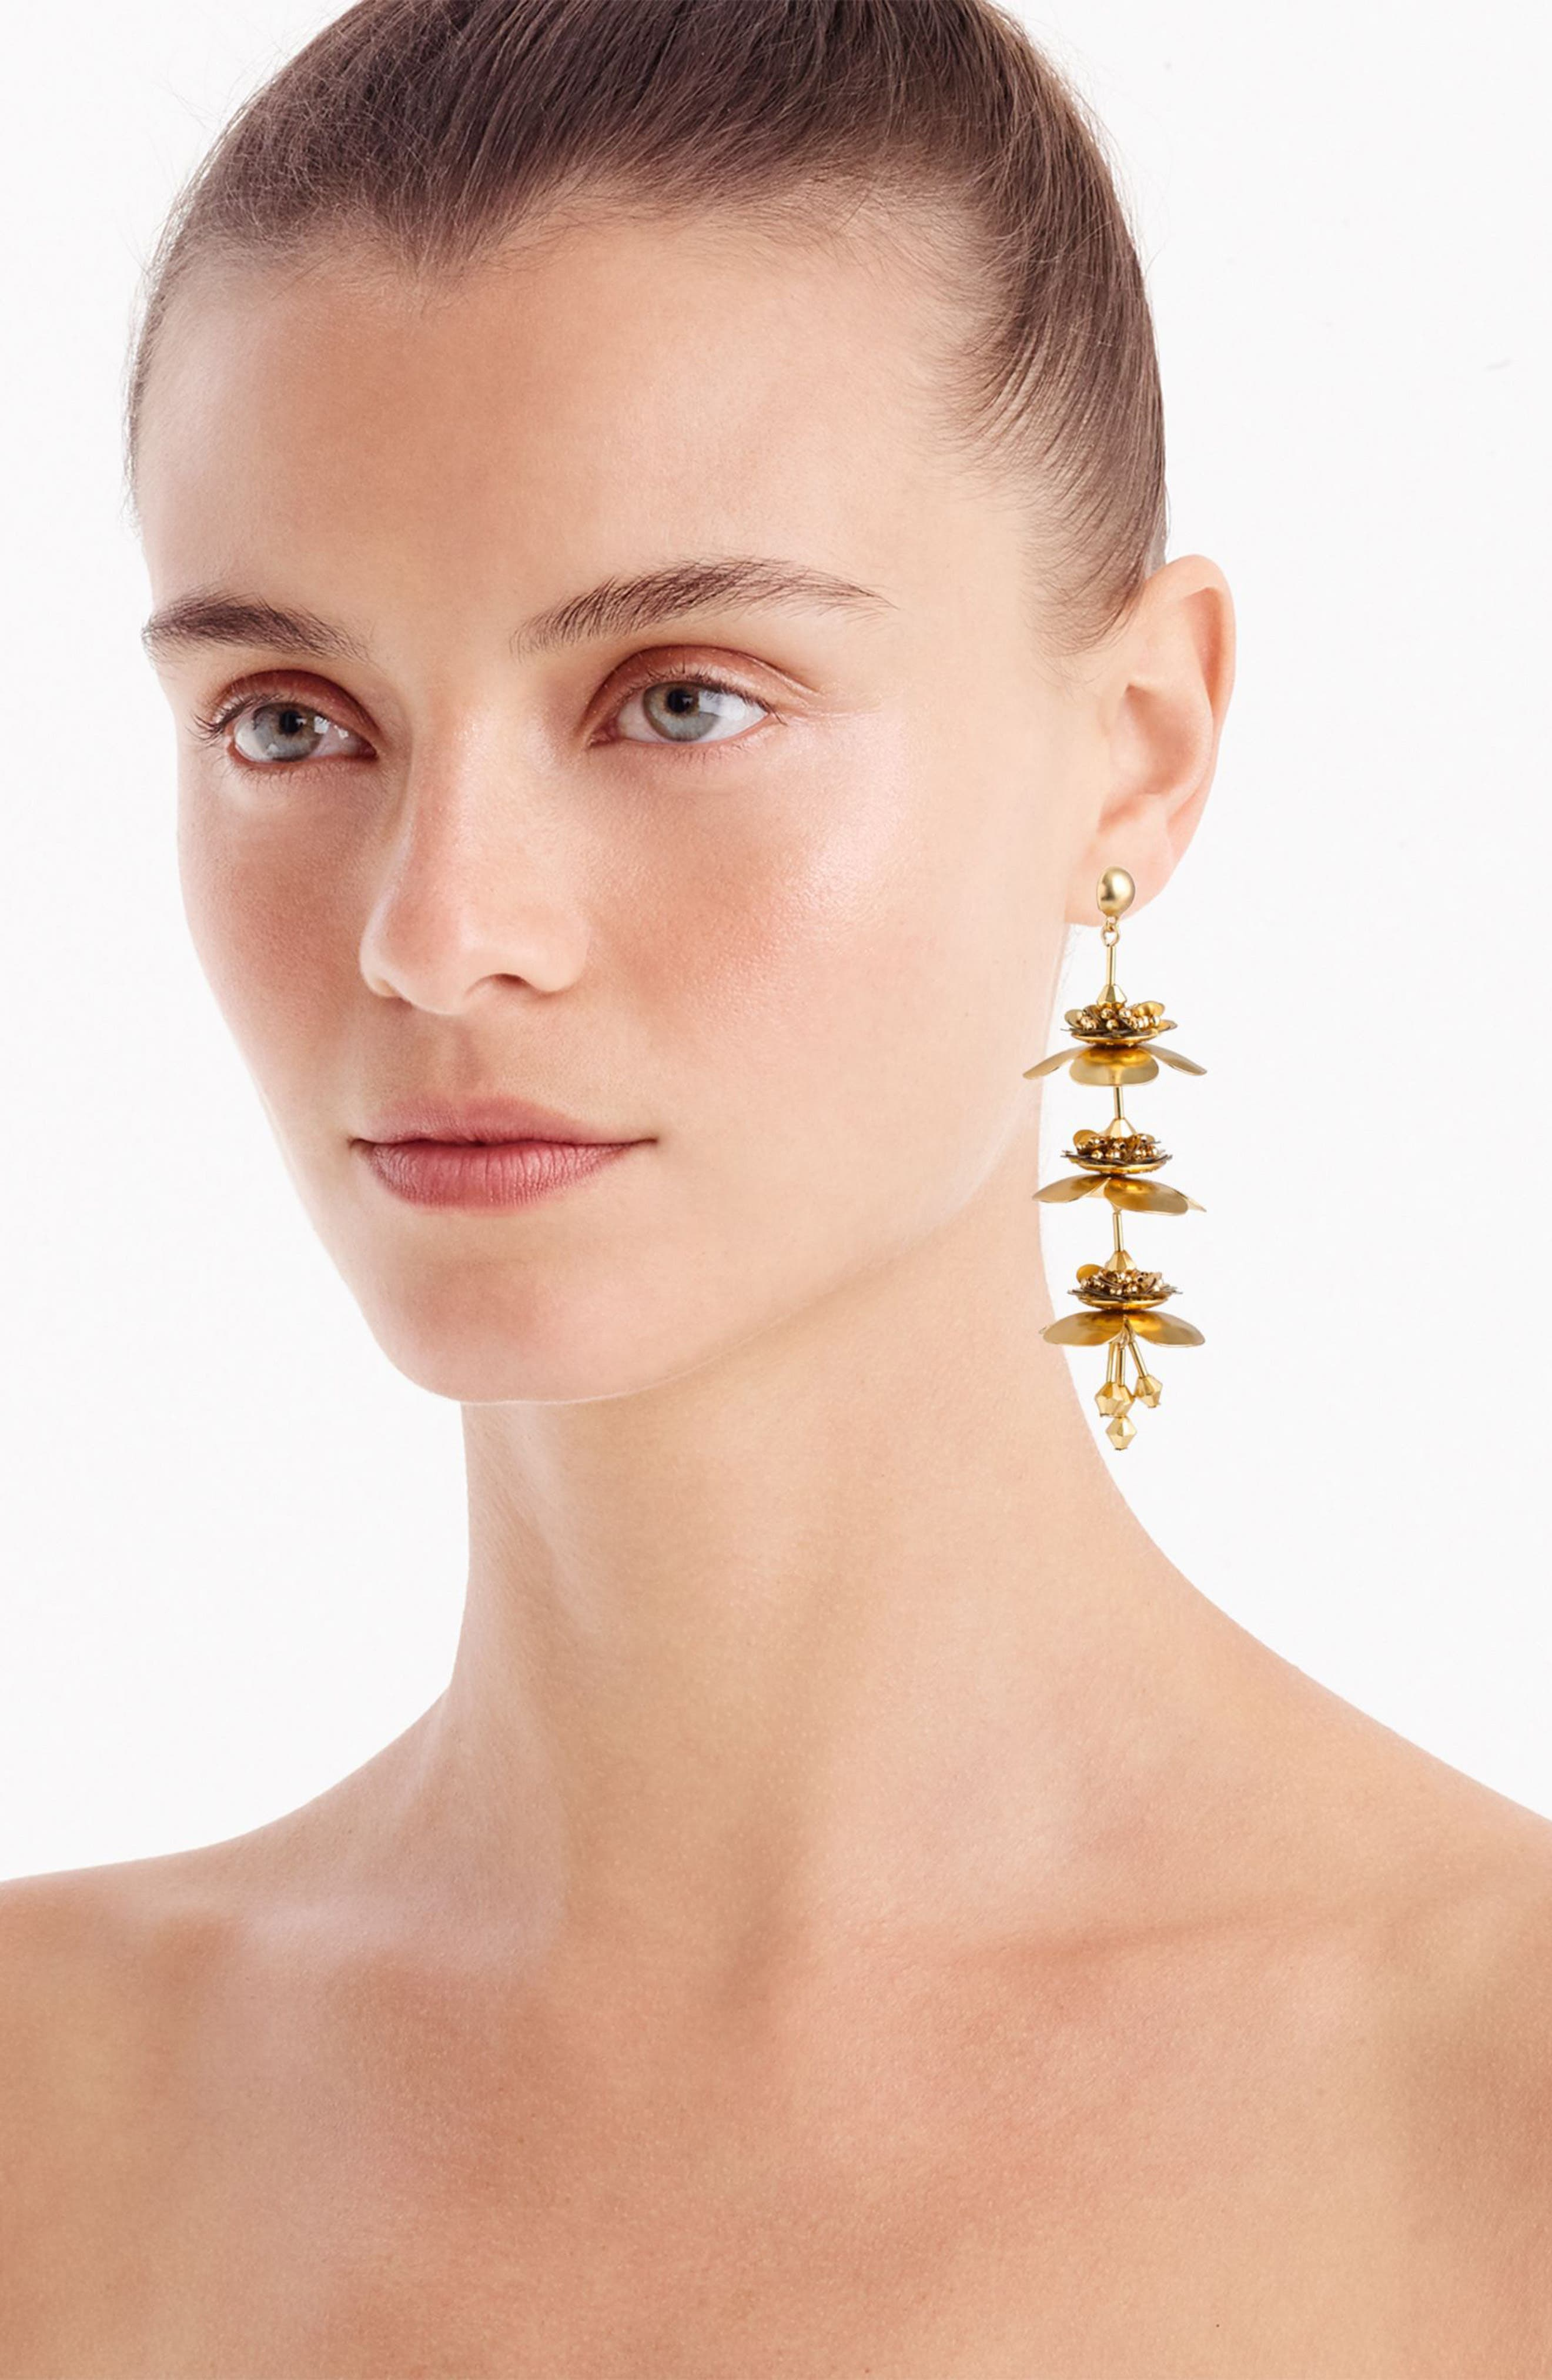 Bead & Blossom Earrings,                             Alternate thumbnail 4, color,